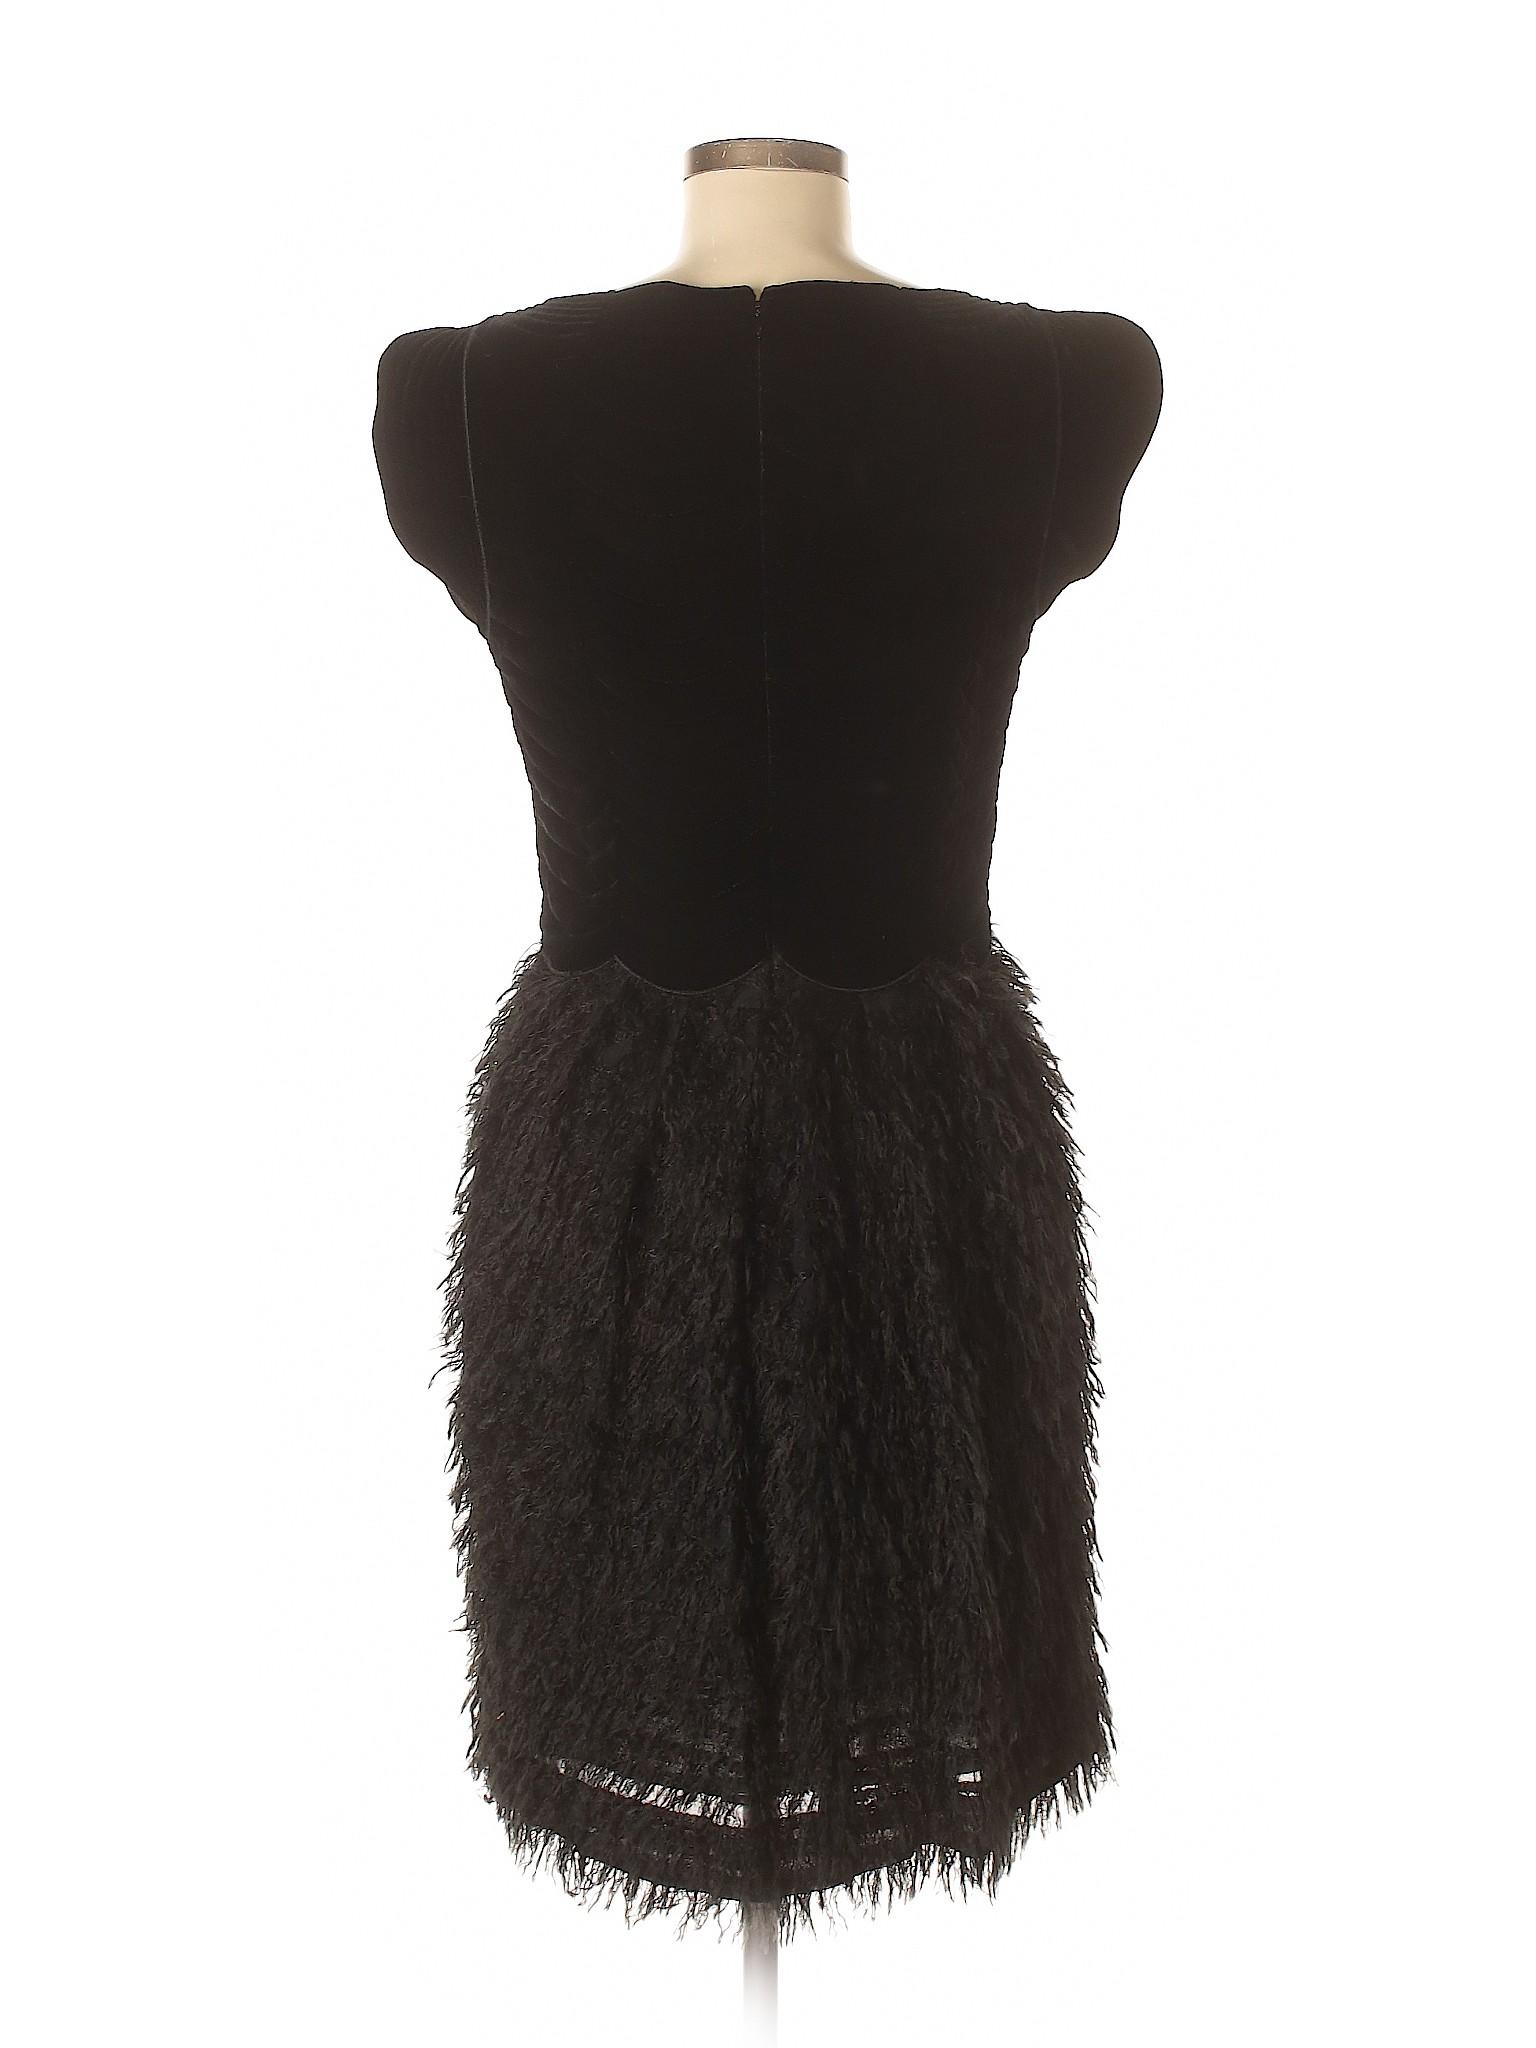 Dress Gaultier Paul Selling Jean Casual wxSqSaf